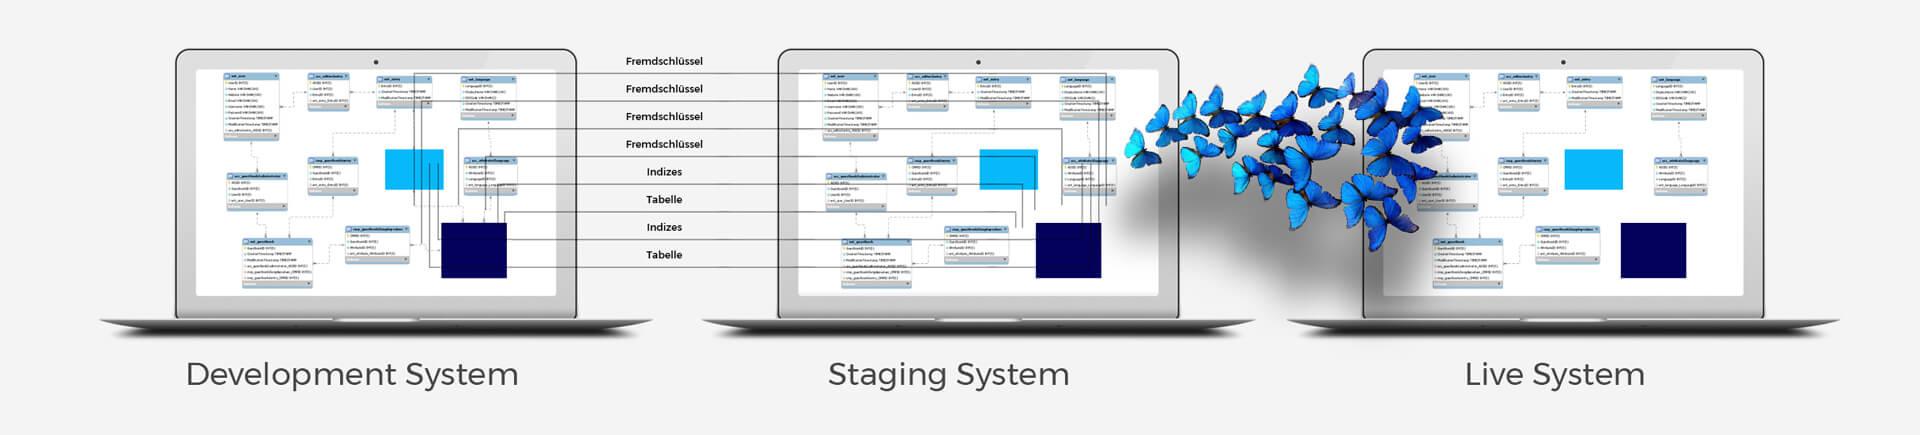 E Business B2B Datenbank Migration Step3 ICONPARC